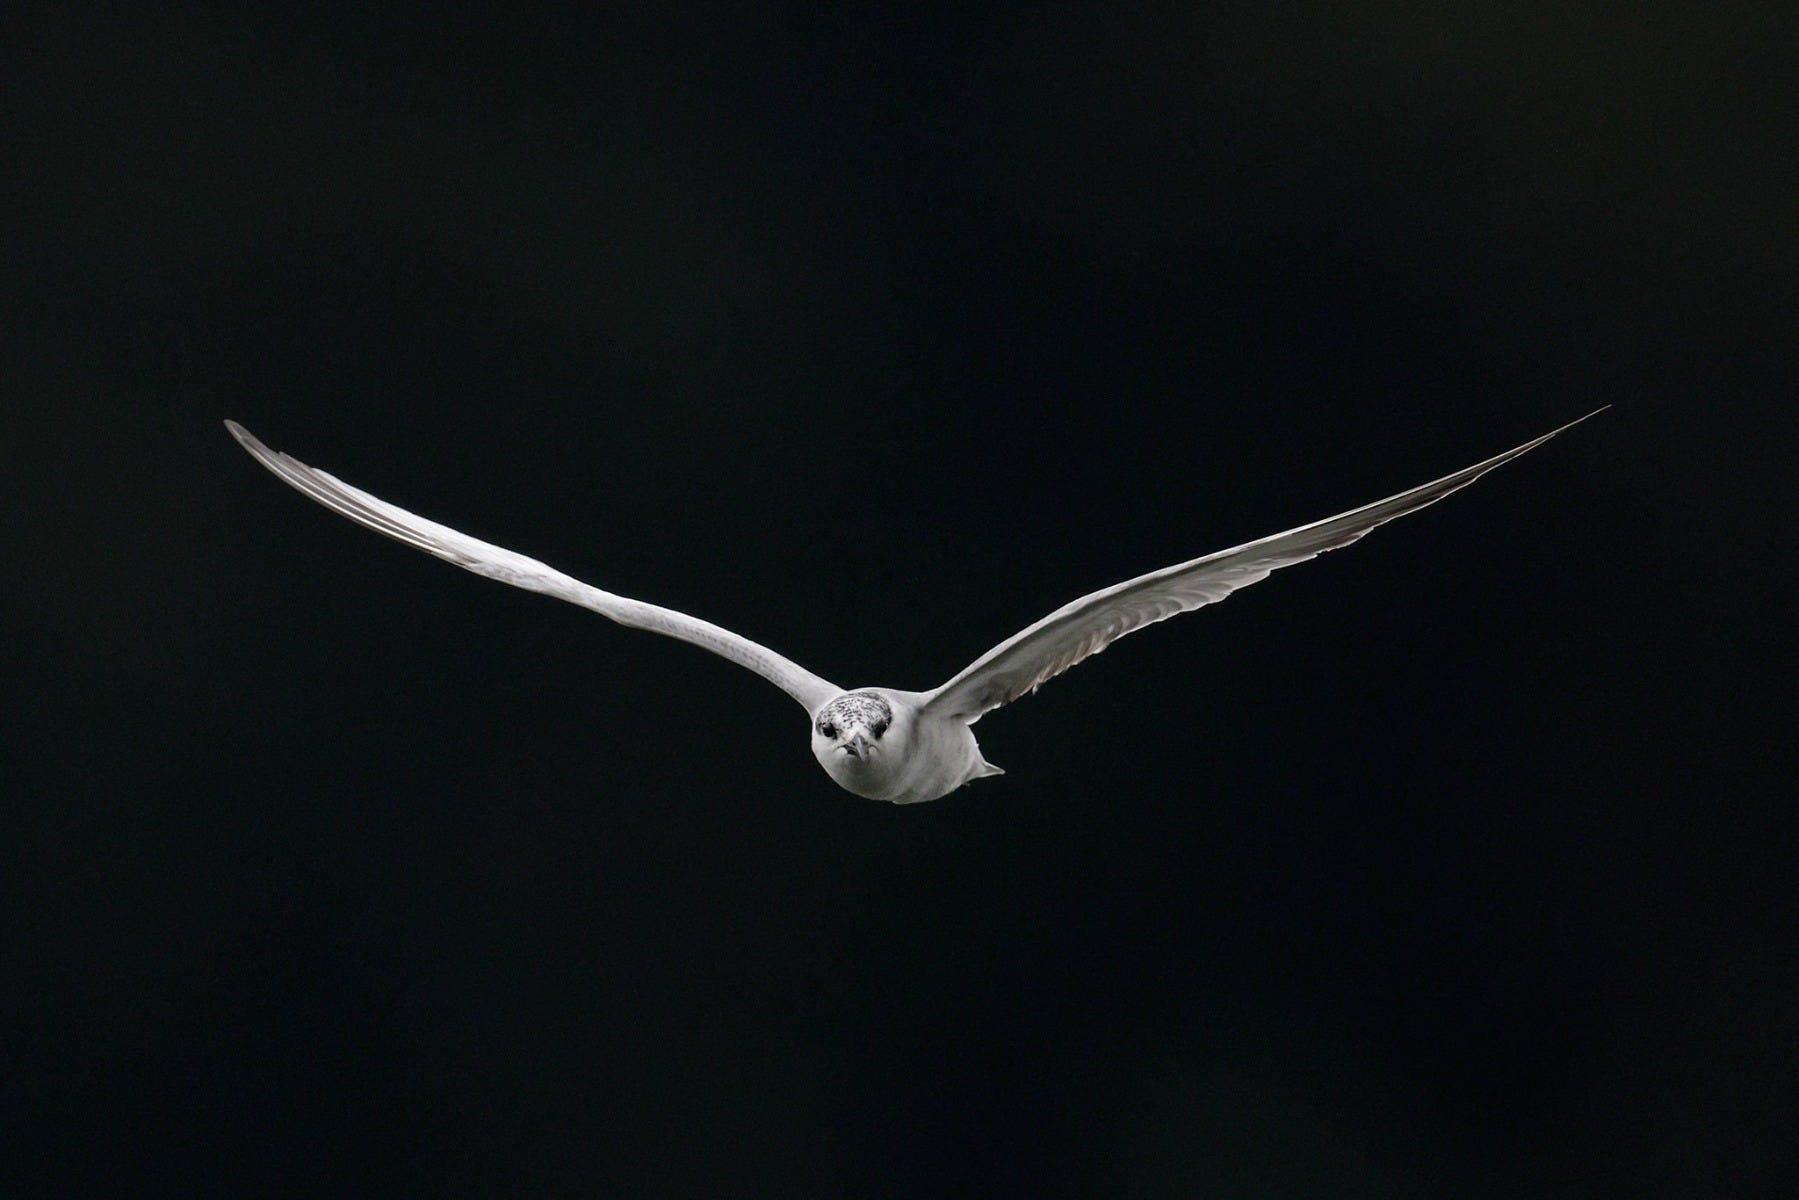 White bird shot by Canon Photographer William Tan using Canon EOS R6